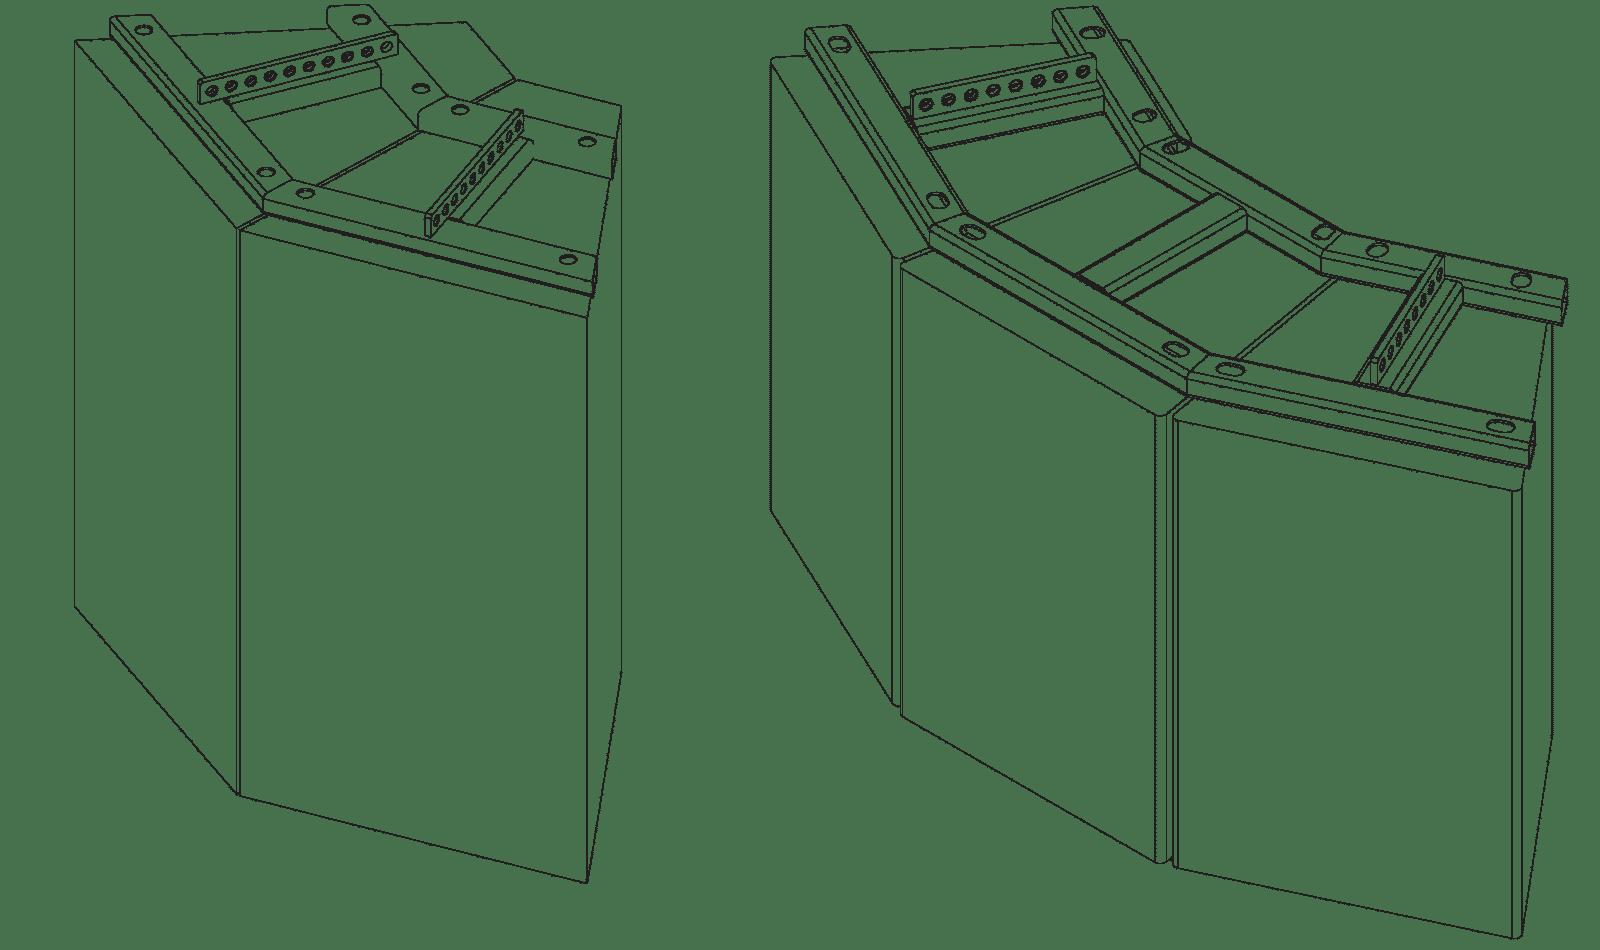 bumperware-drawing-good